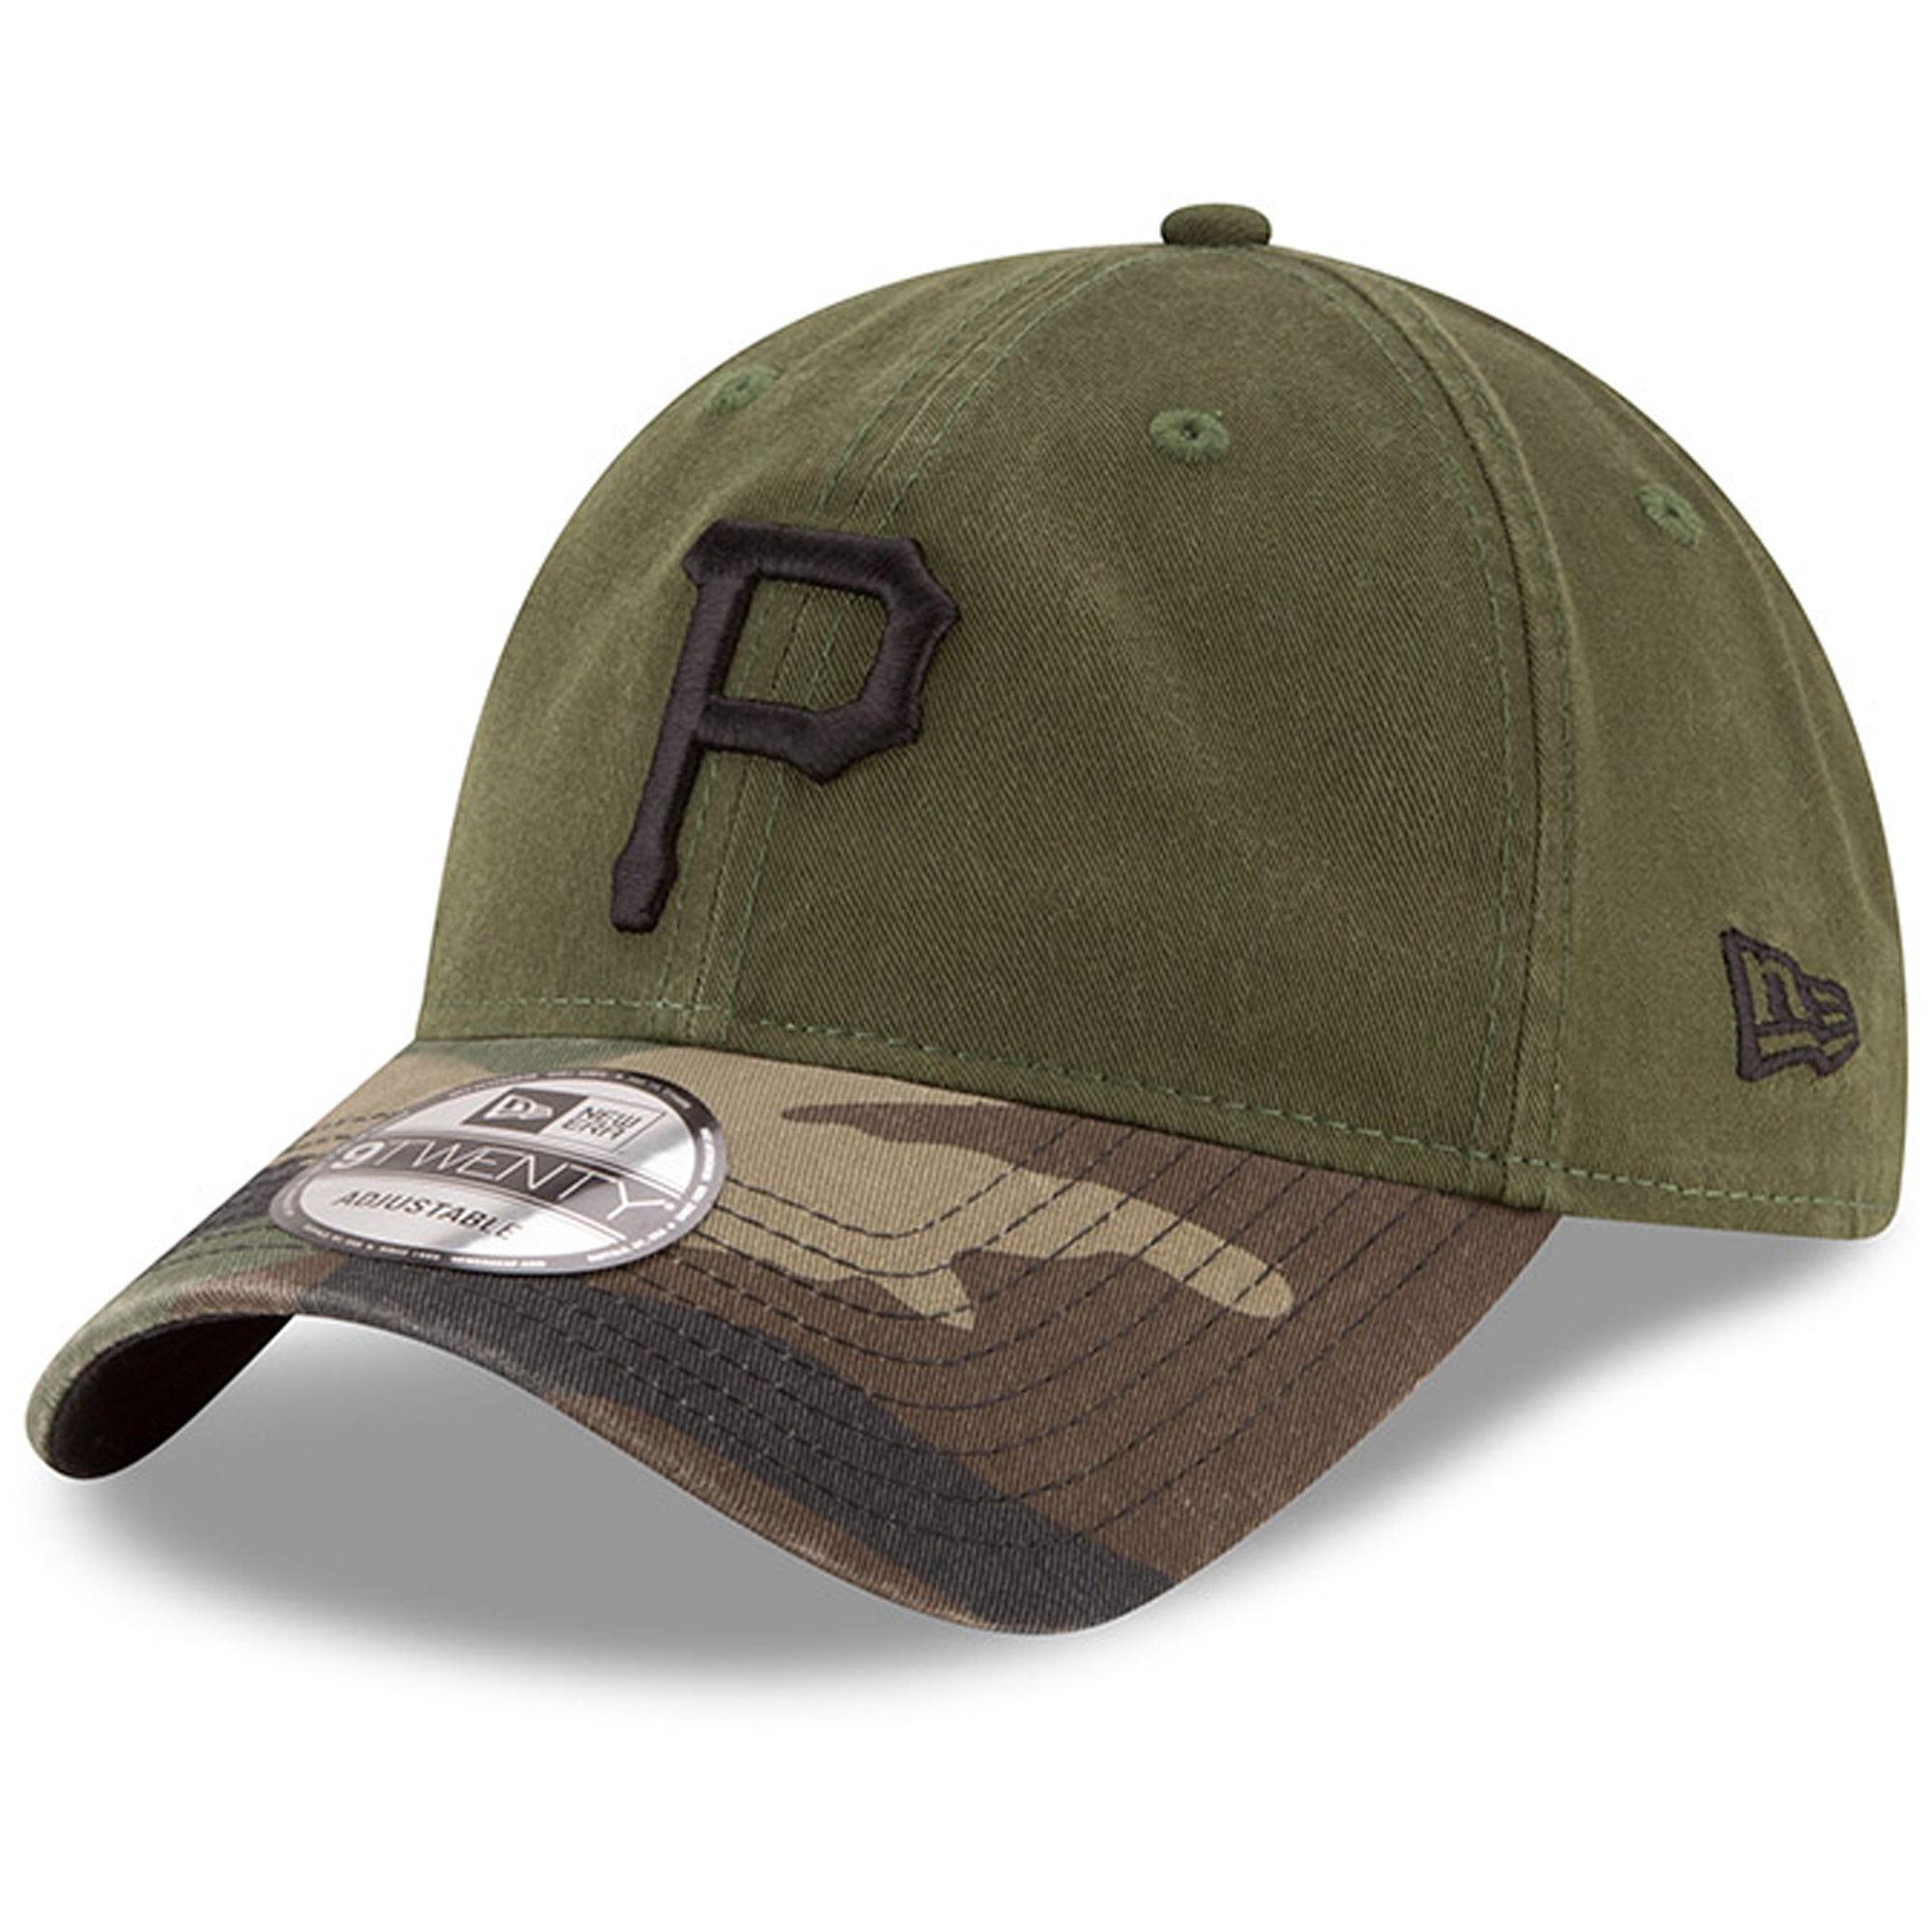 Pittsburgh Pirates New Era Alternate 3 Replica Core Classic 9TWENTY Adjustable Hat - Olive - OSFA